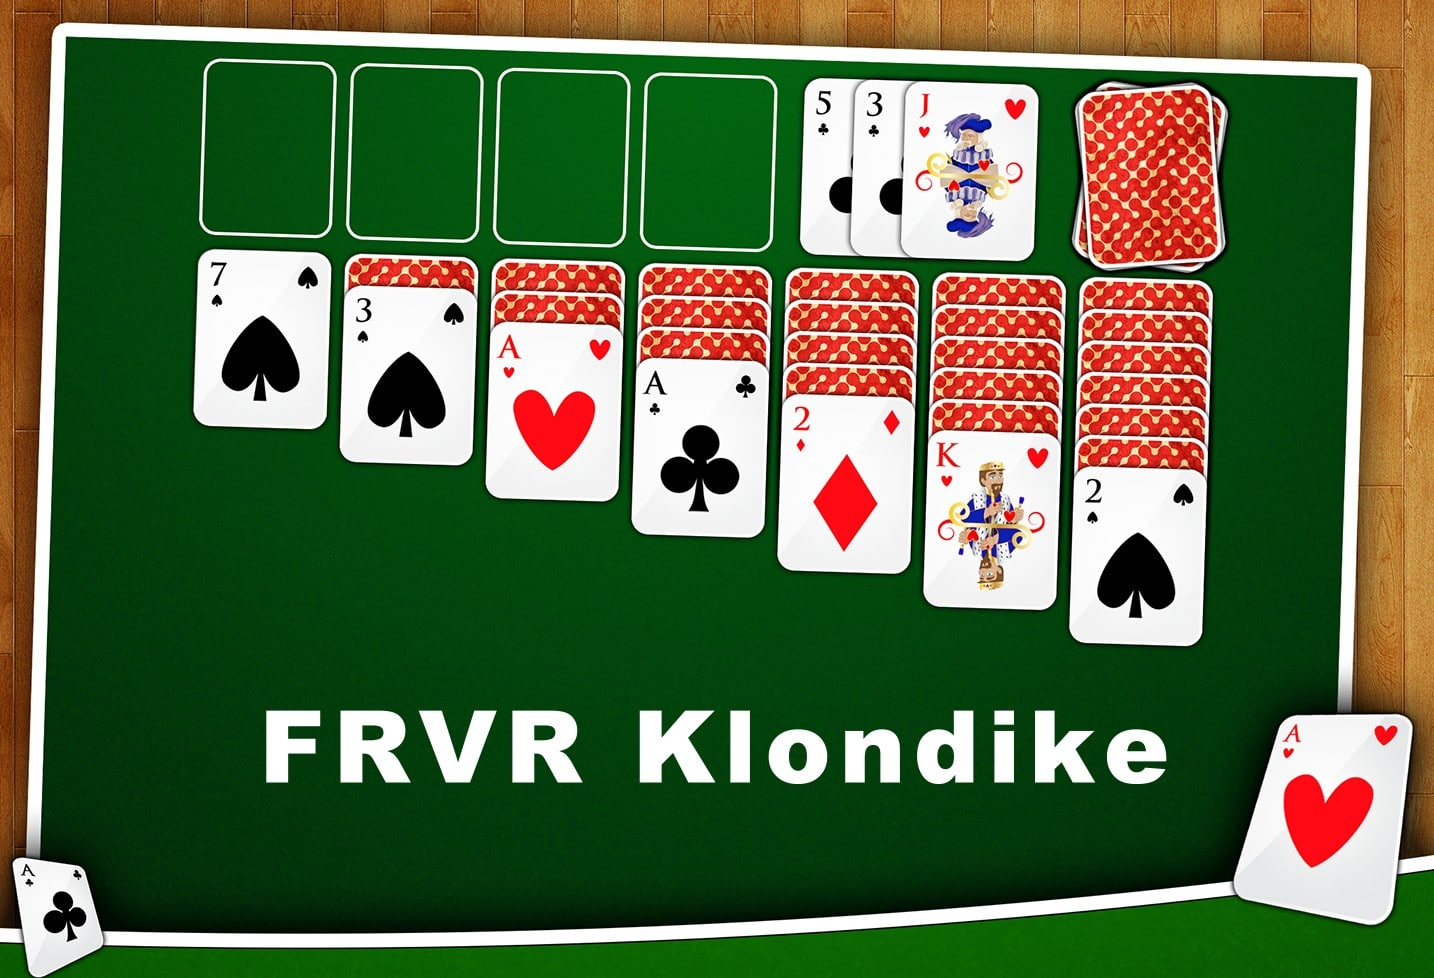 Image FRVR Klondike